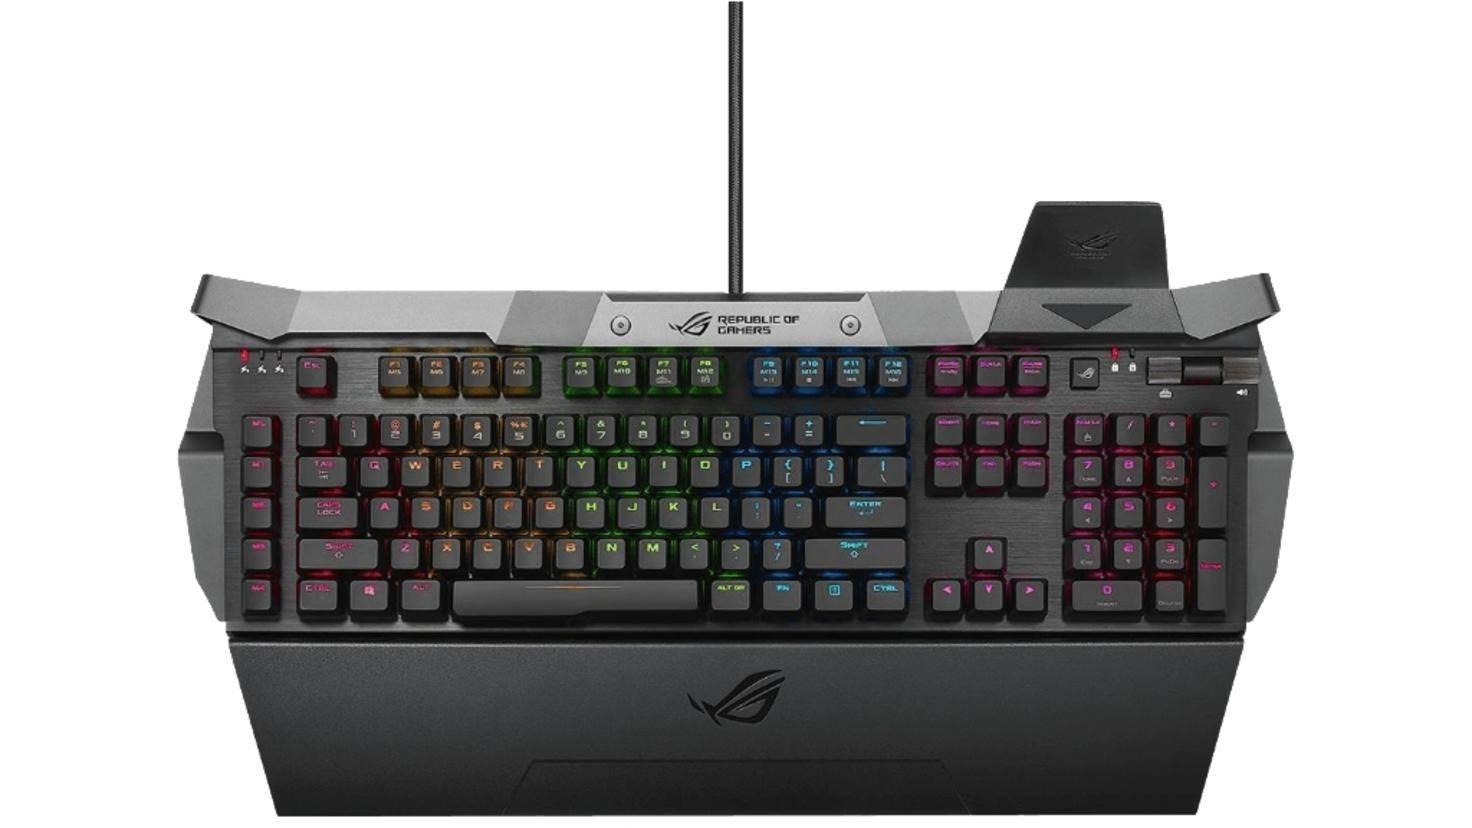 ASUS-ROG-GK2000-RGB--Gaming-Tastatur